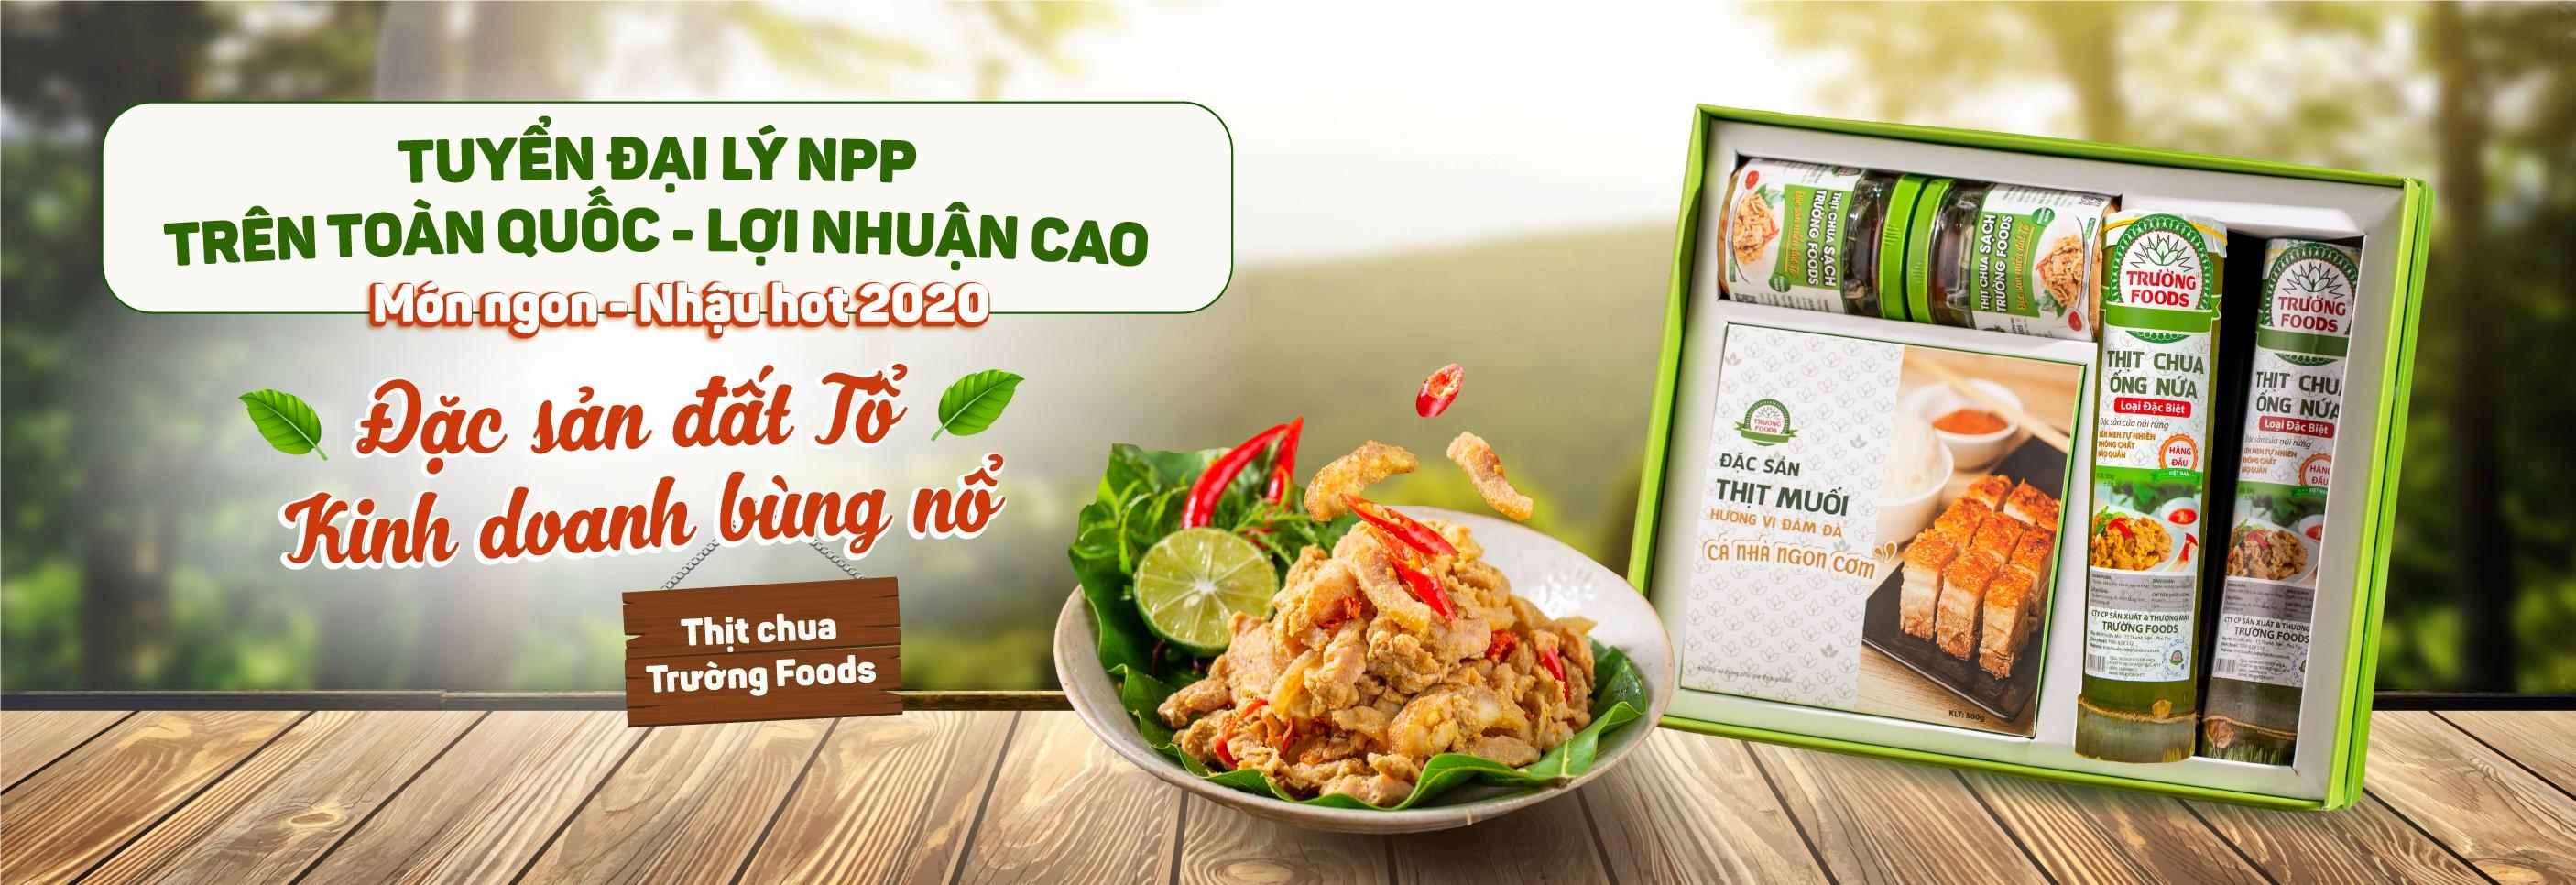 Thịt chua truongfoods